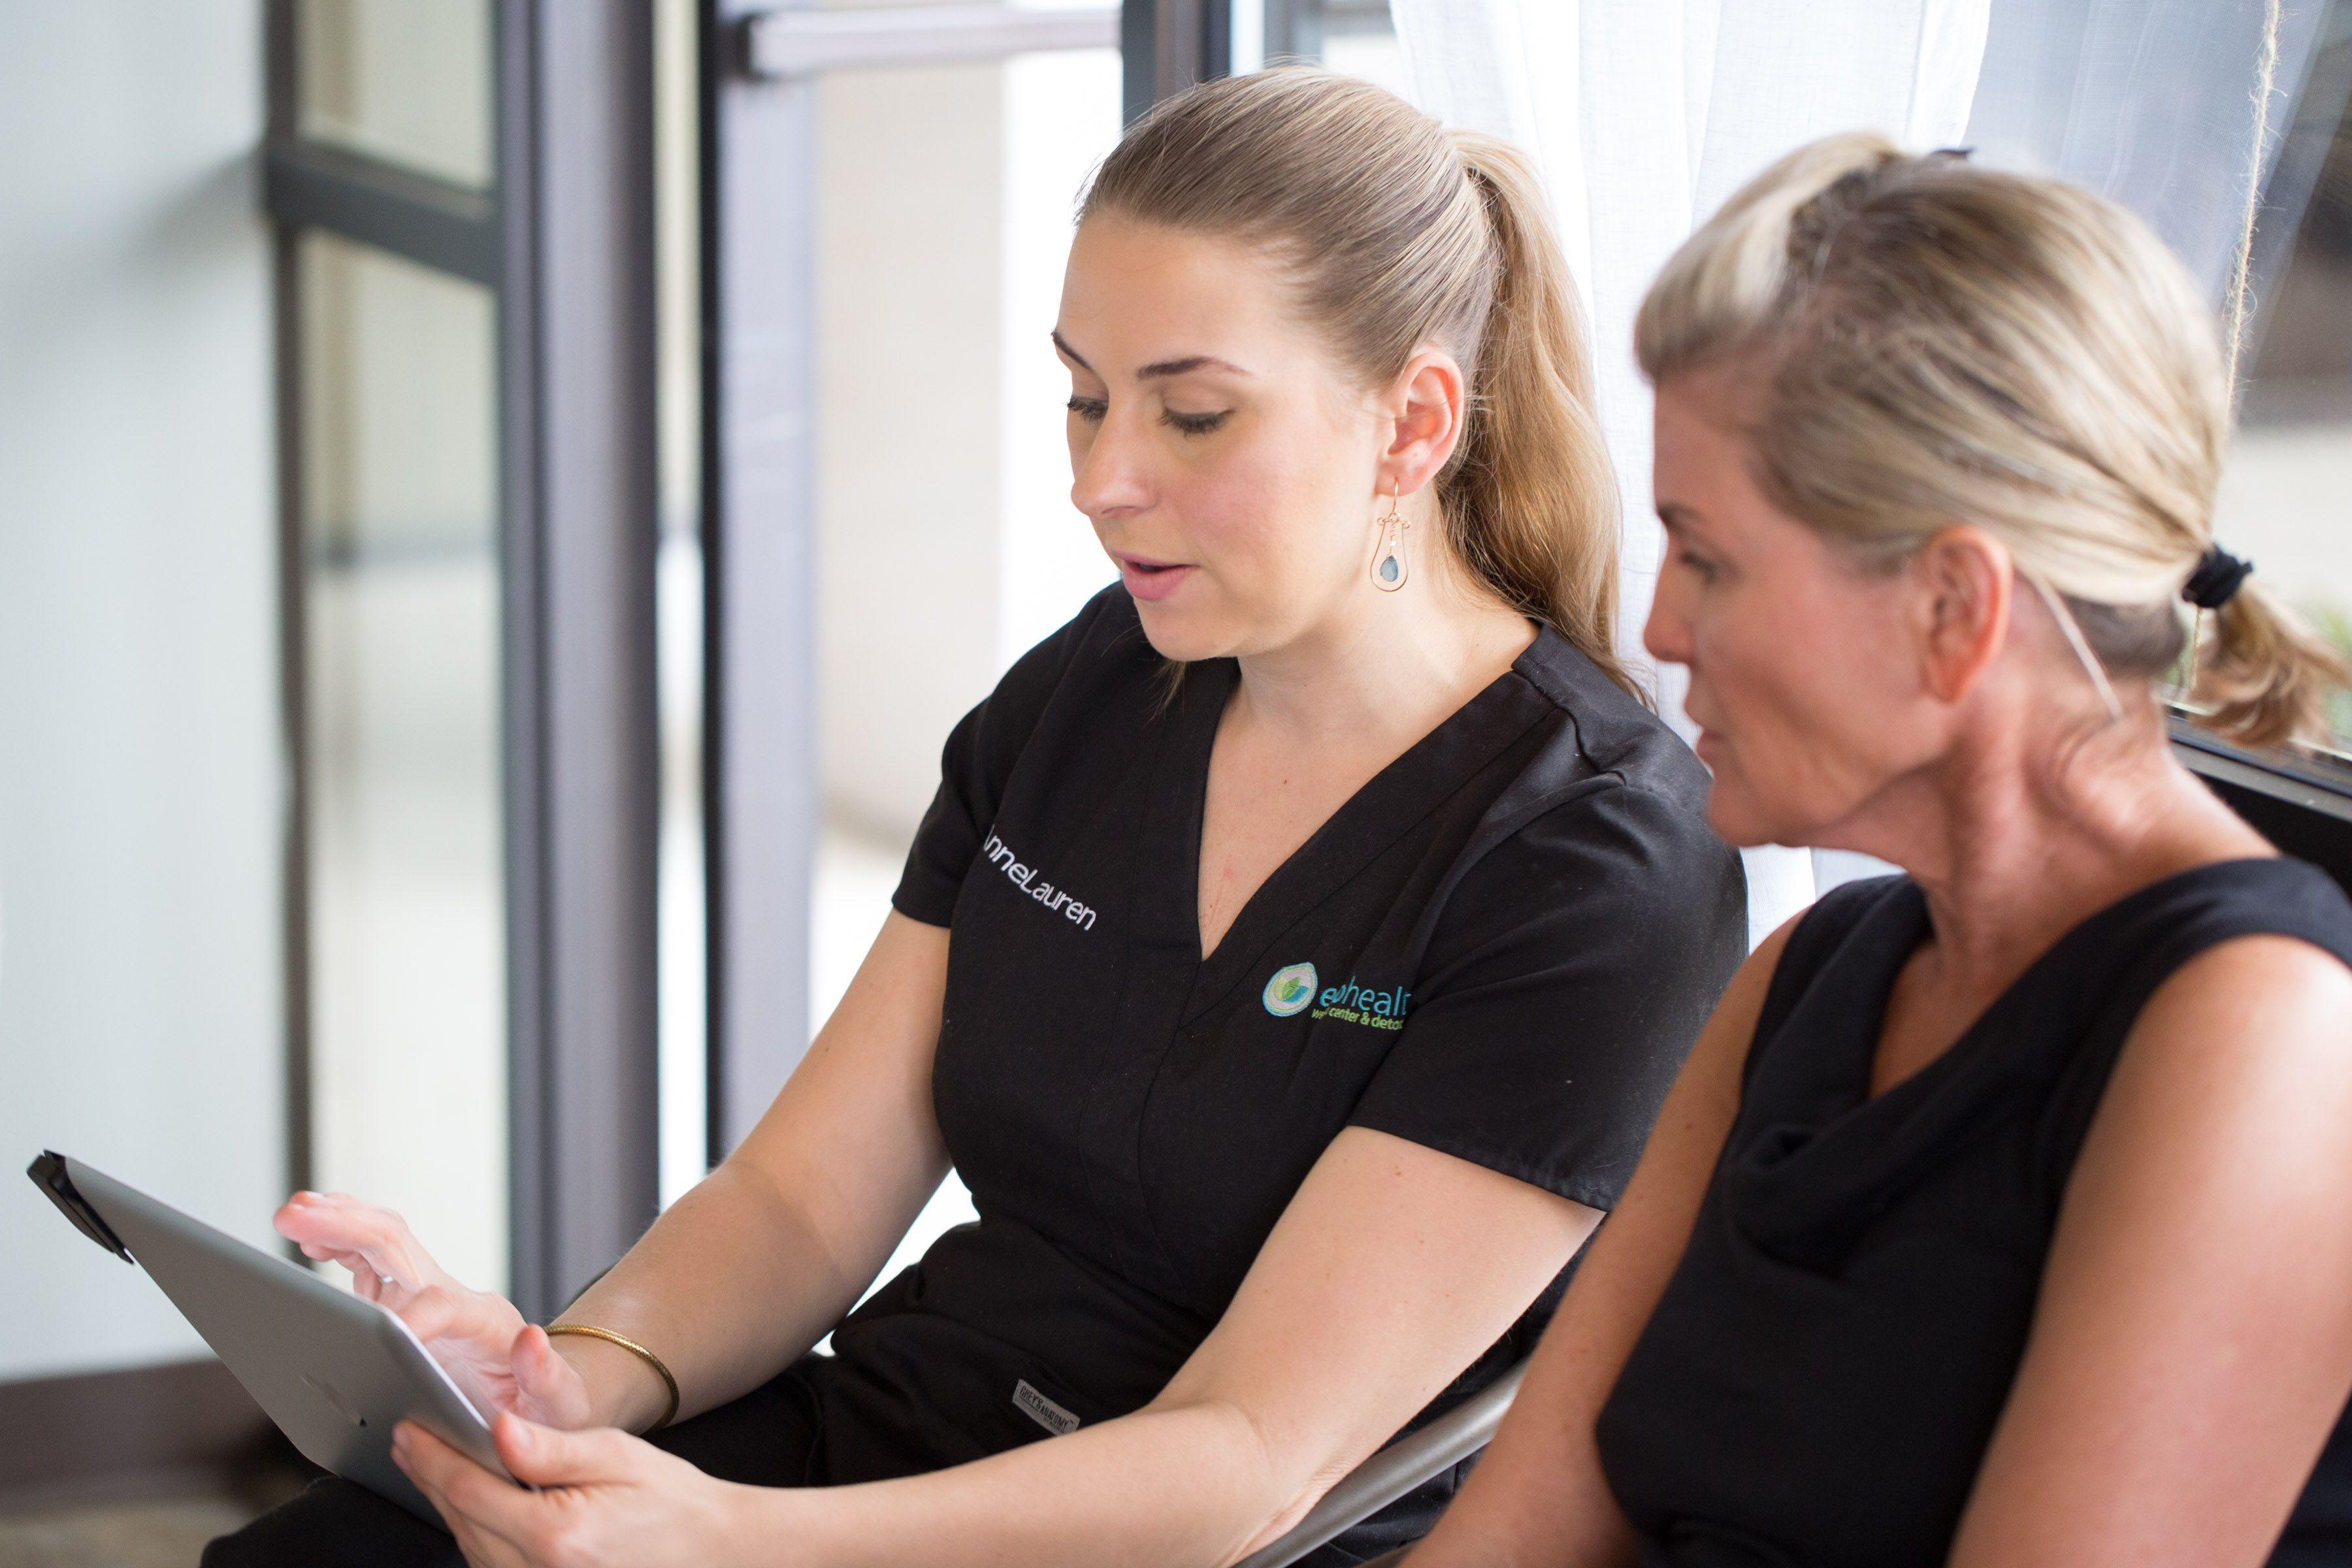 Ecohealth wellness center detox spa synergistically